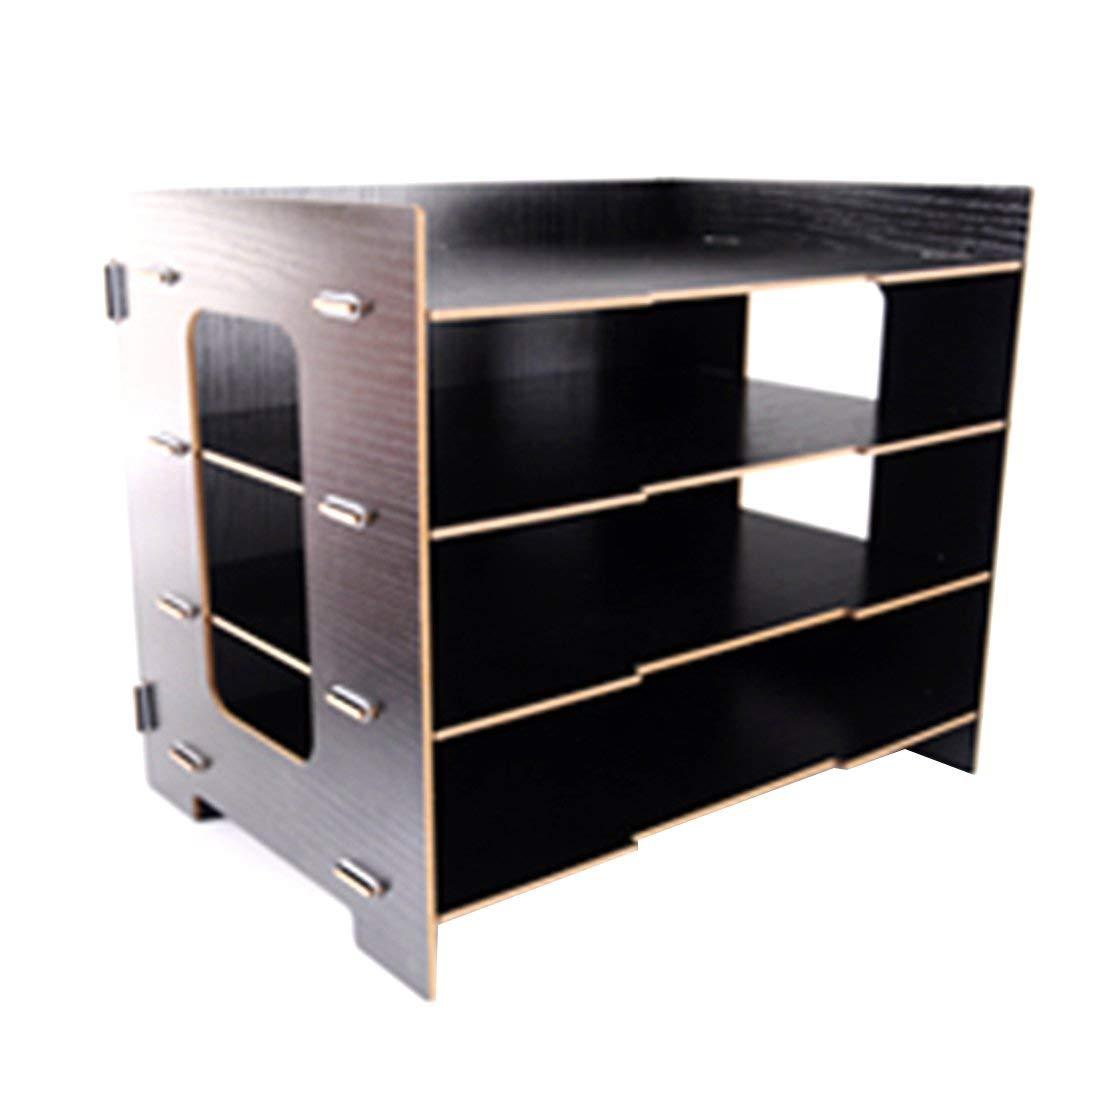 Cheap Black Office Storage Find Black Office Storage Deals On Line At Alibaba Com